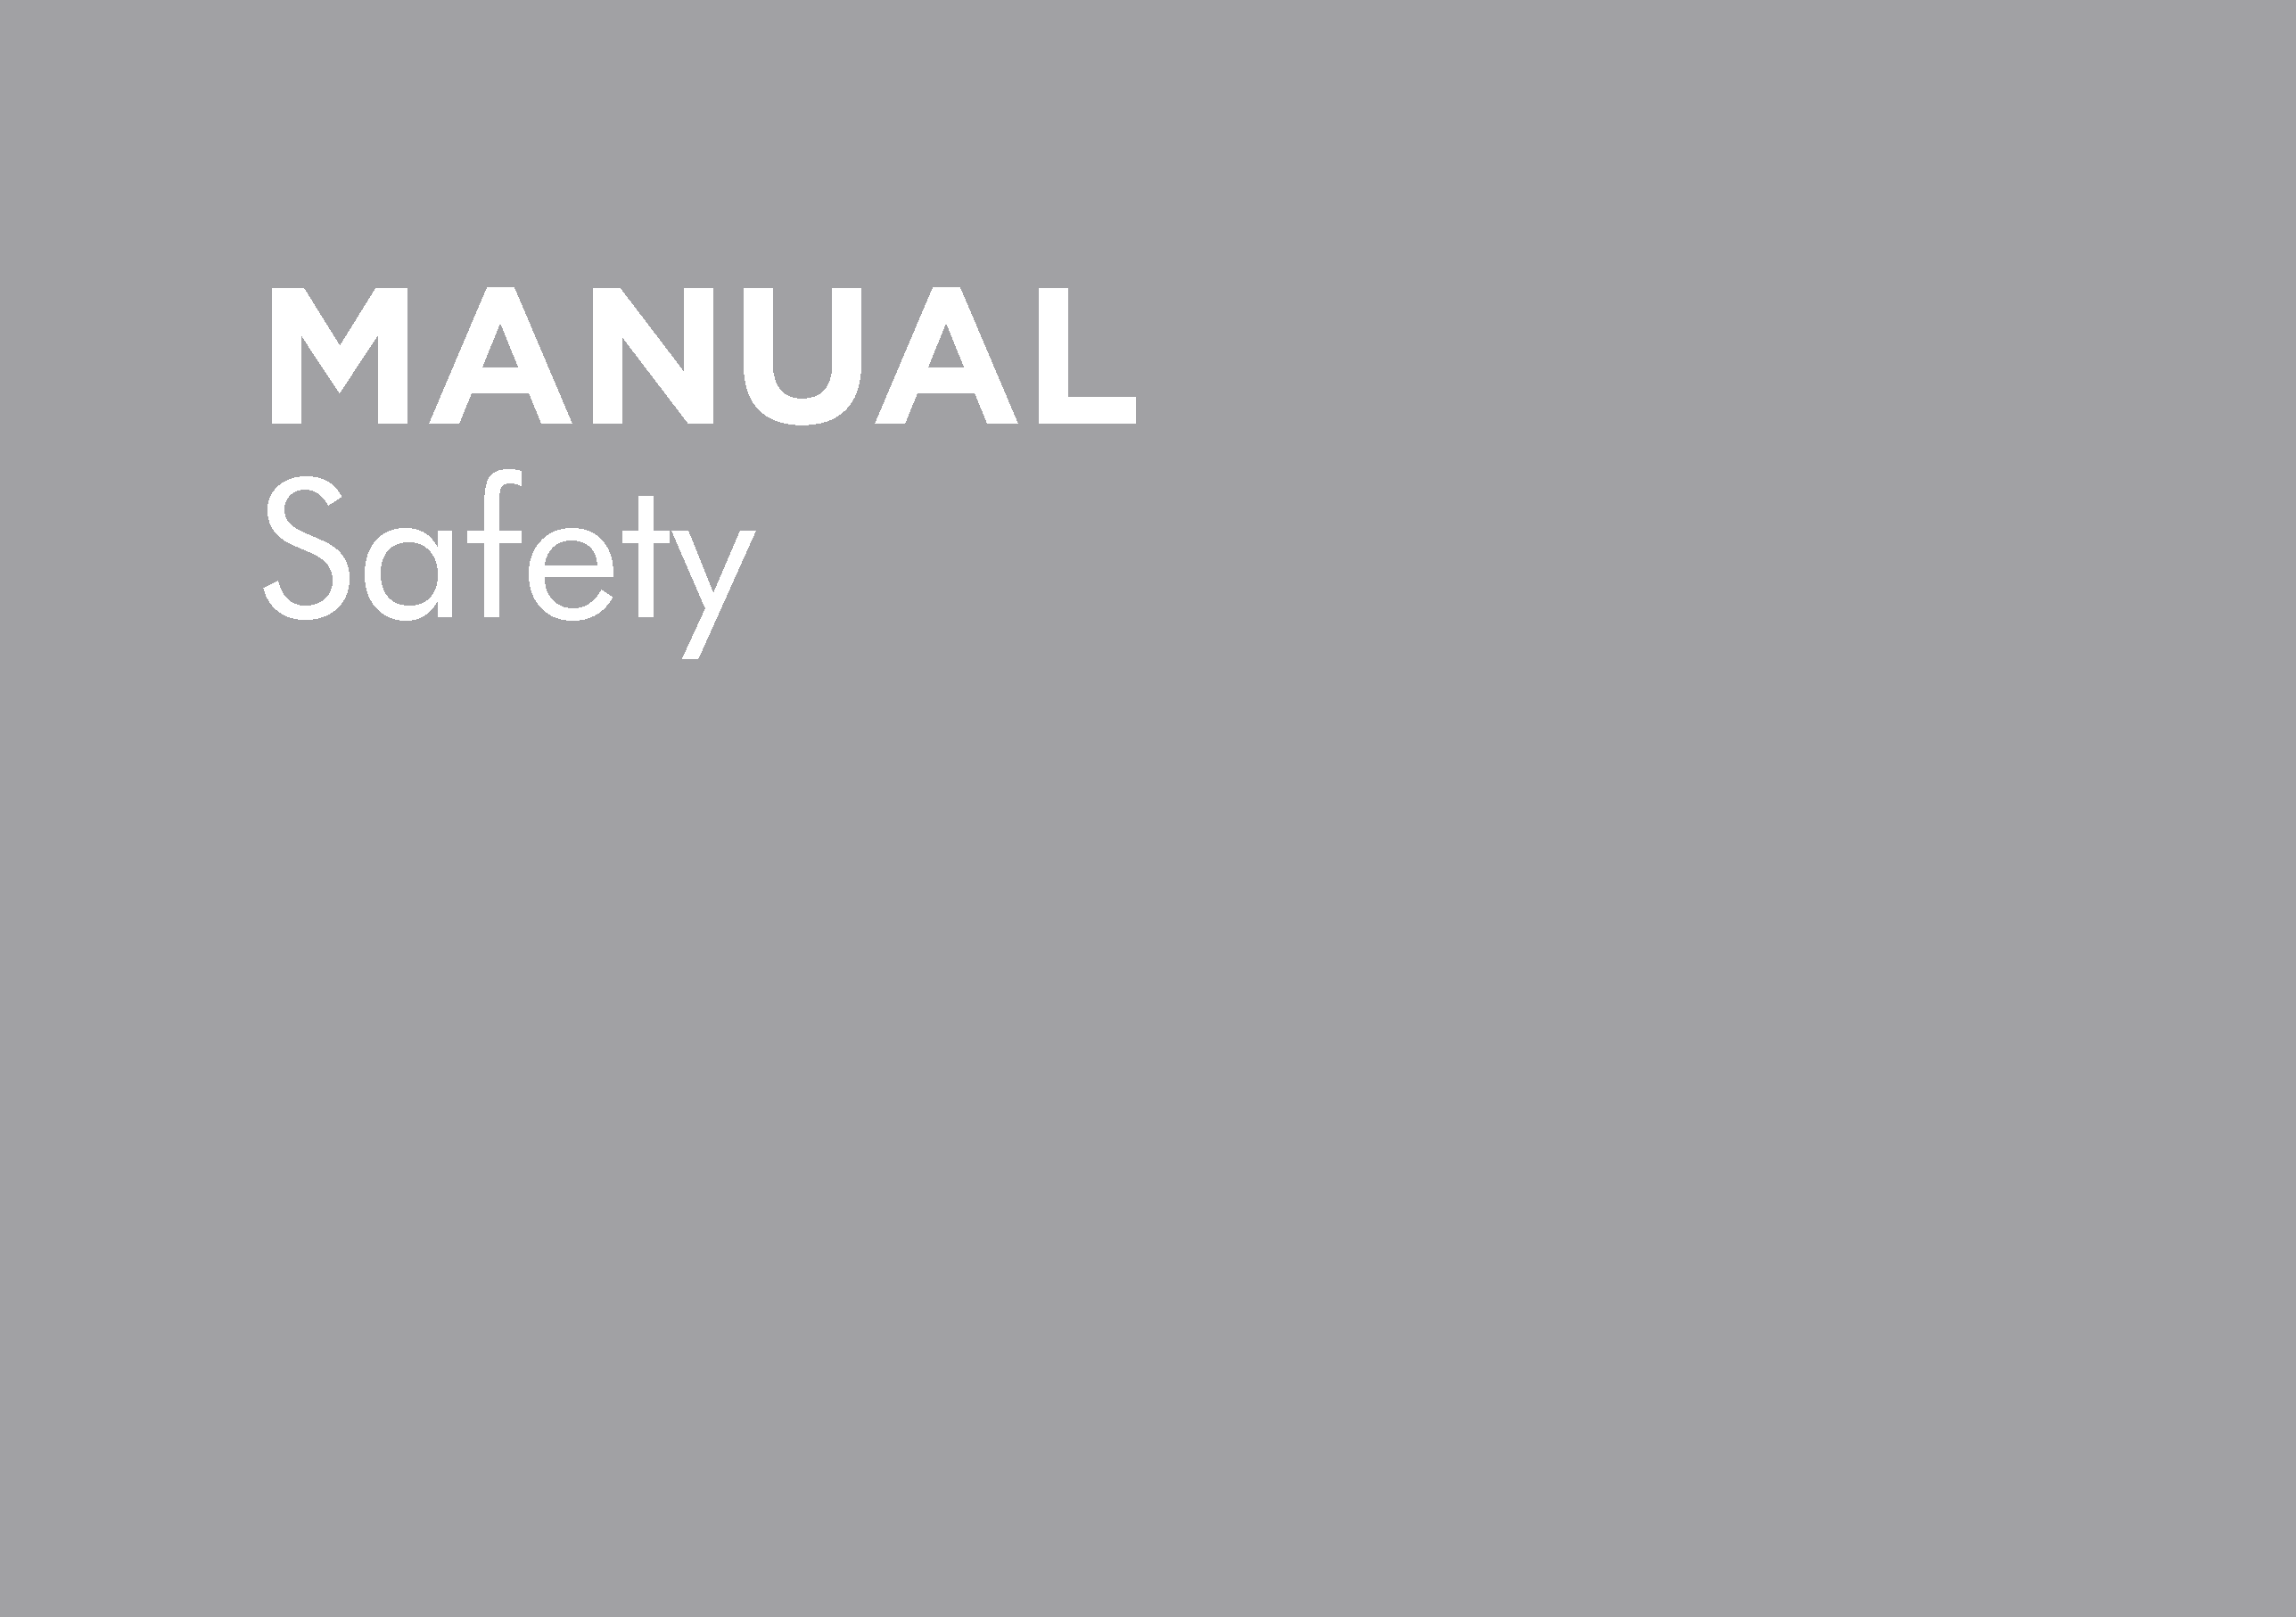 GP-SAFE-A – ALL PURPOSE SAFETY MANUAL V2B (1)